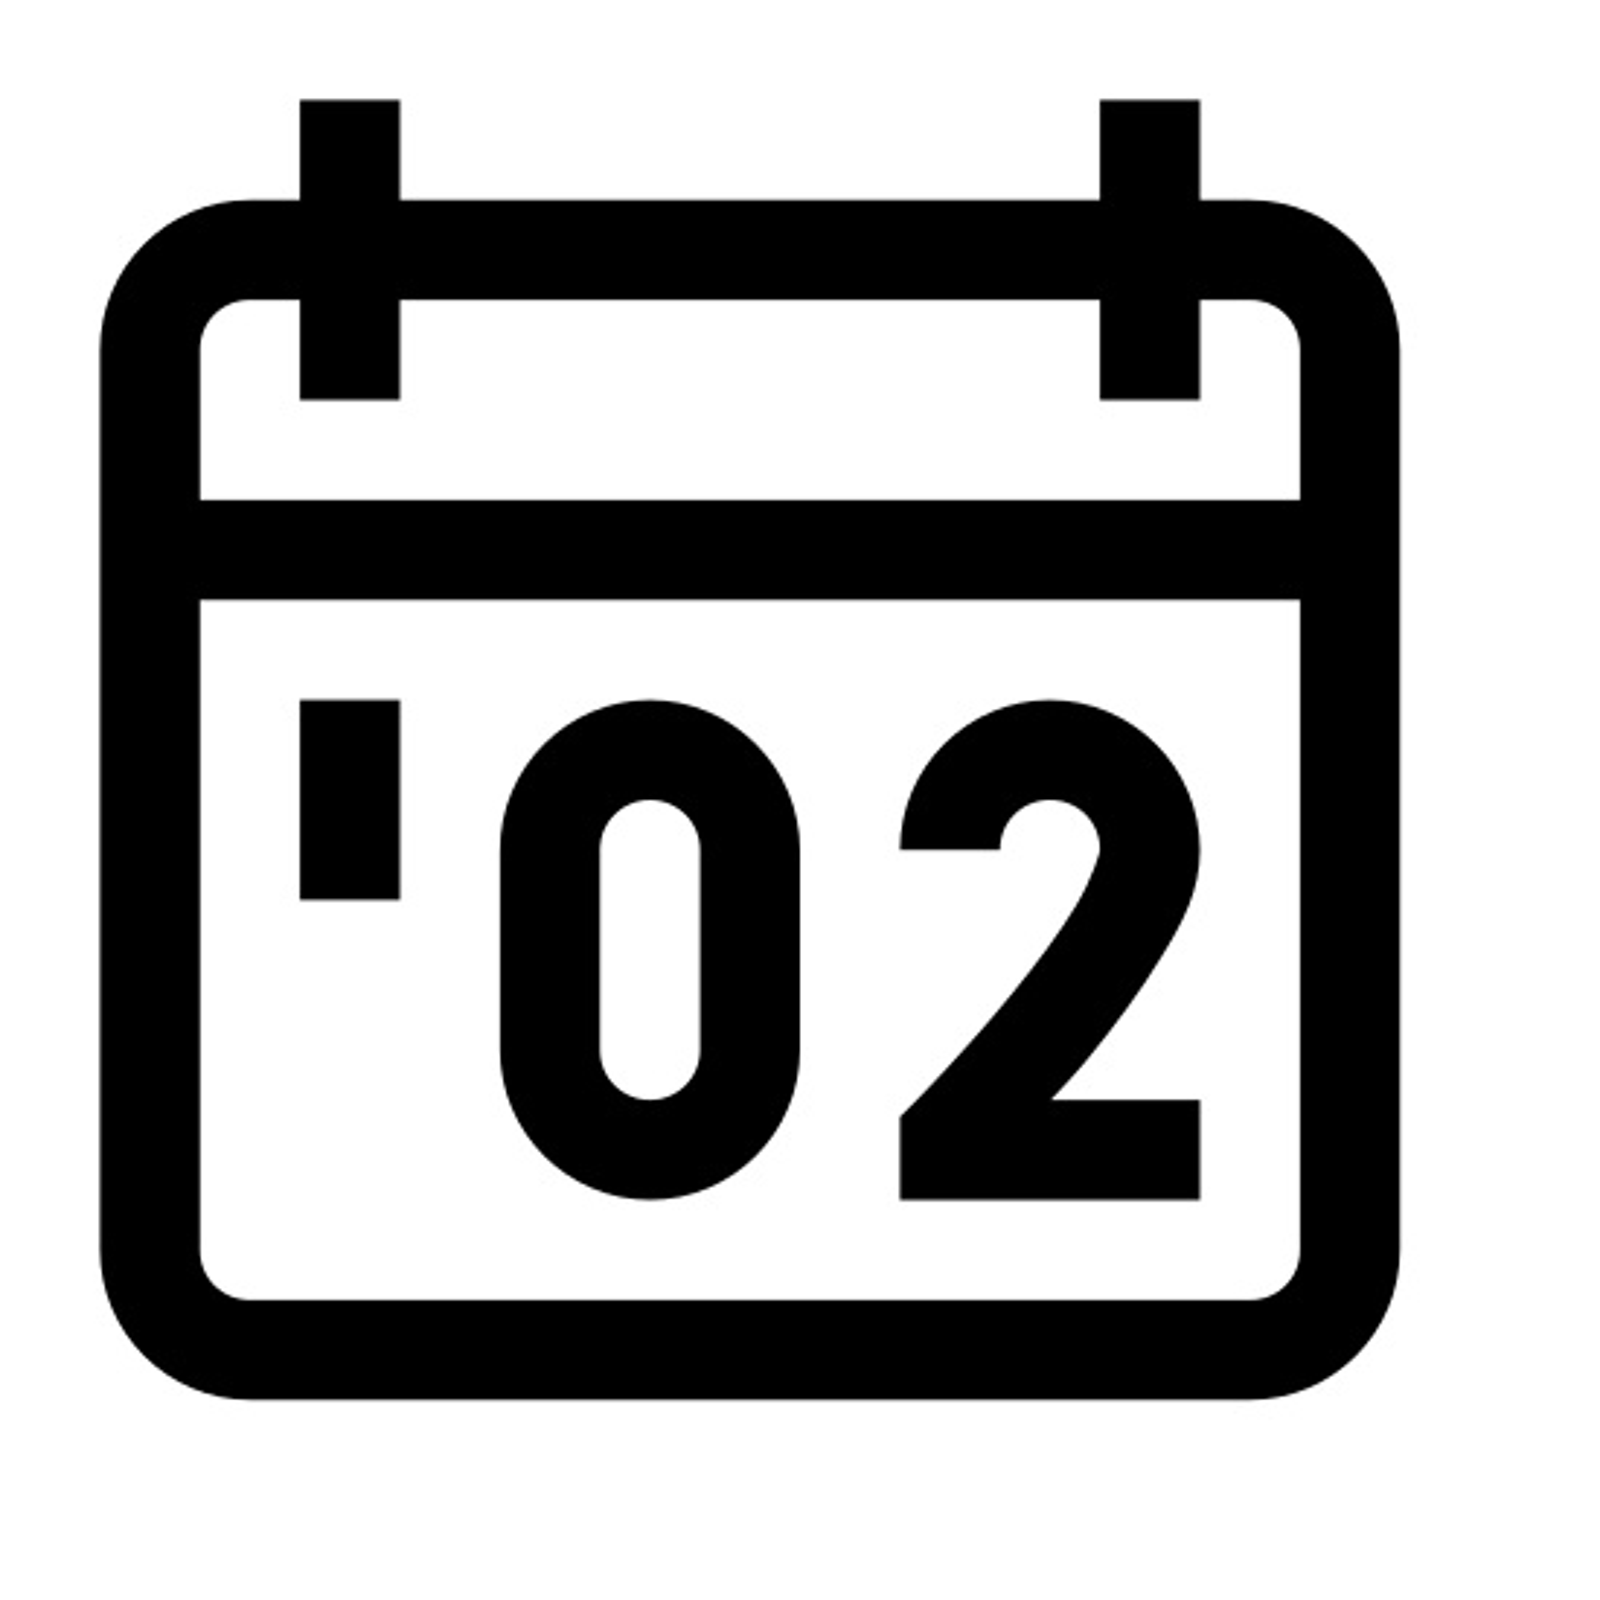 2002 icon